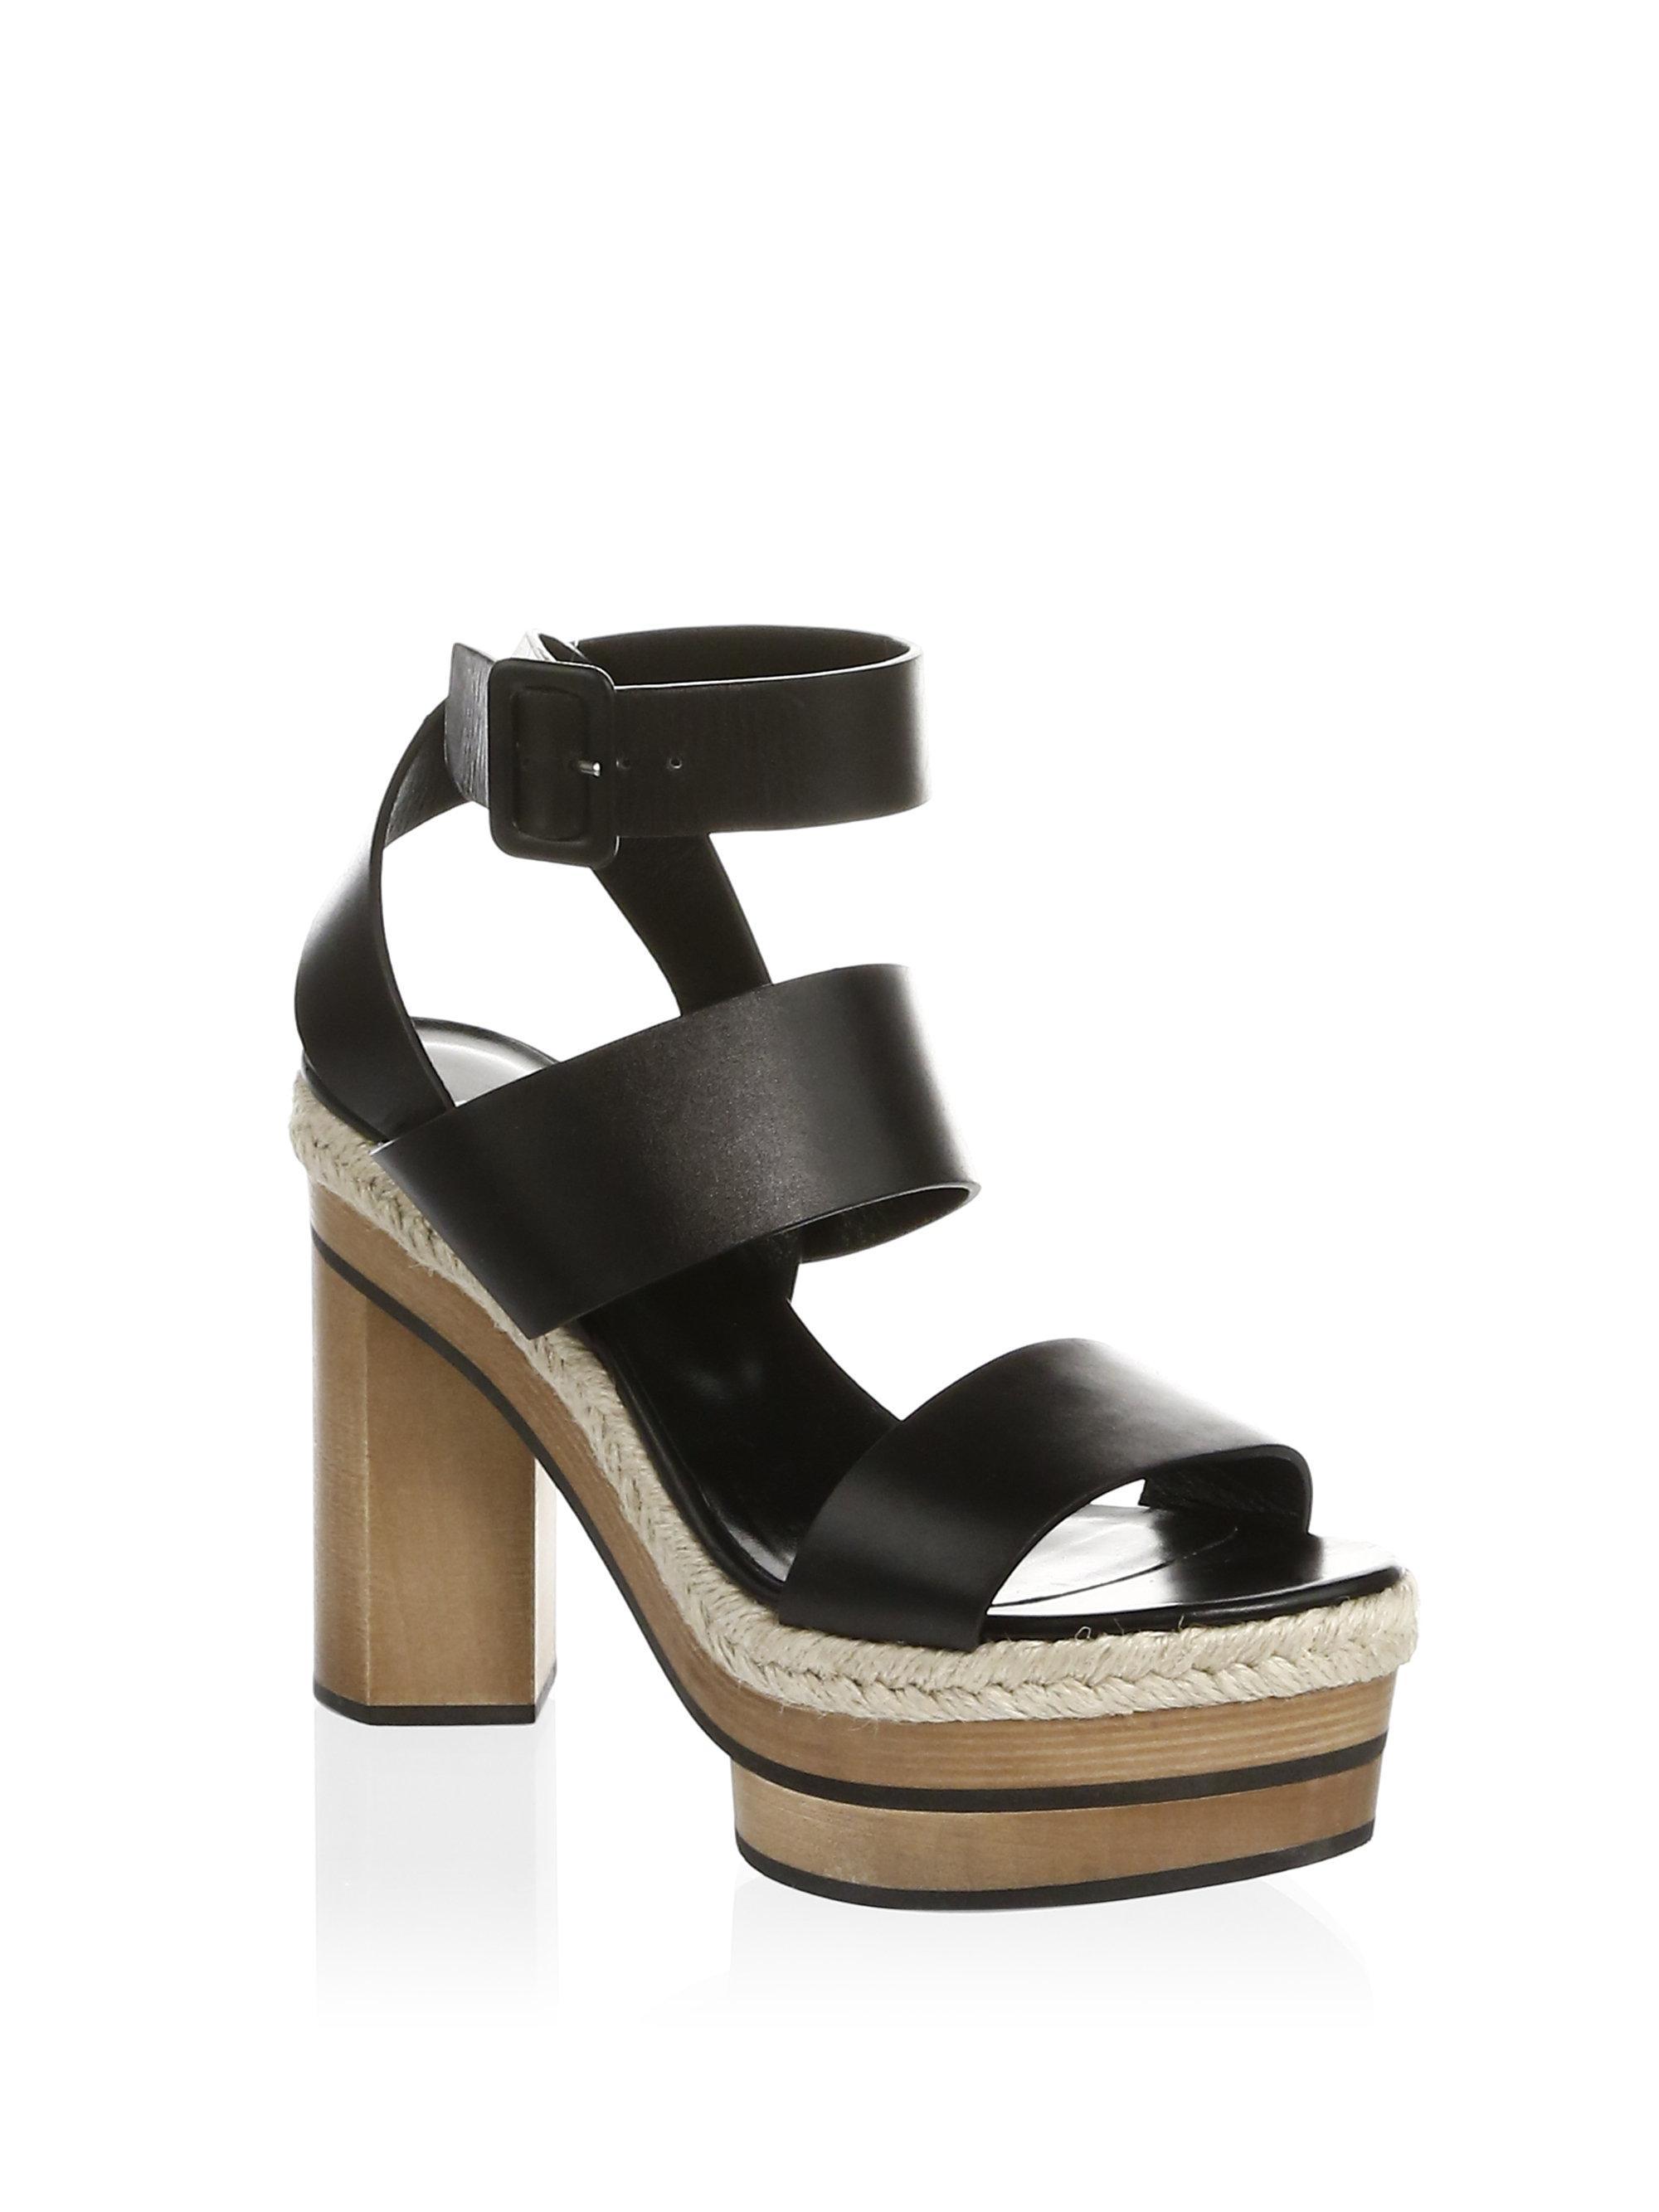 Deck sandals - Black Pierre Hardy CYZfvypY